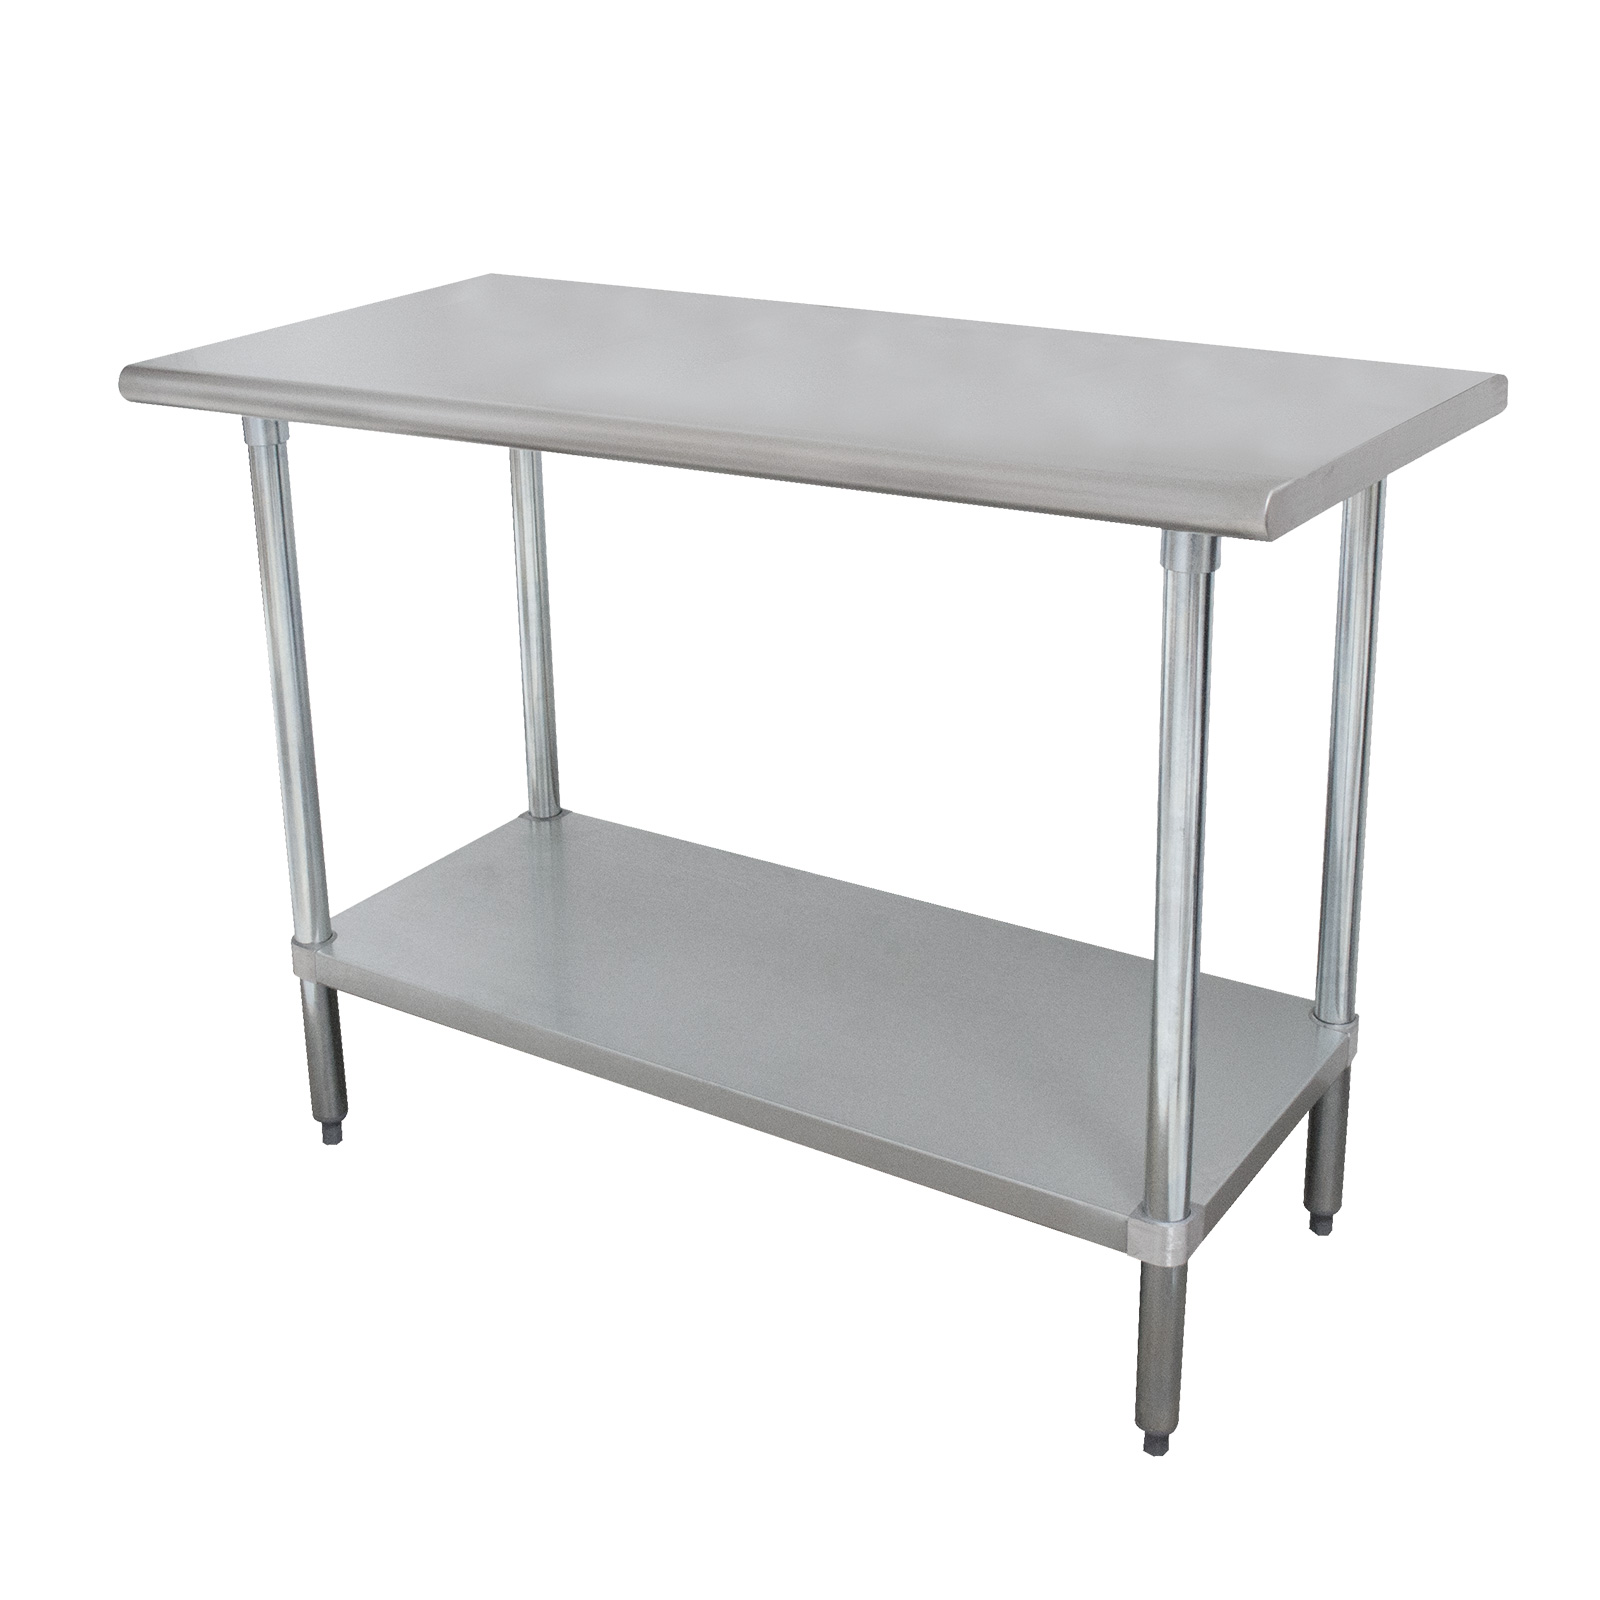 Advance Tabco MSLAG-244-X work table,  40